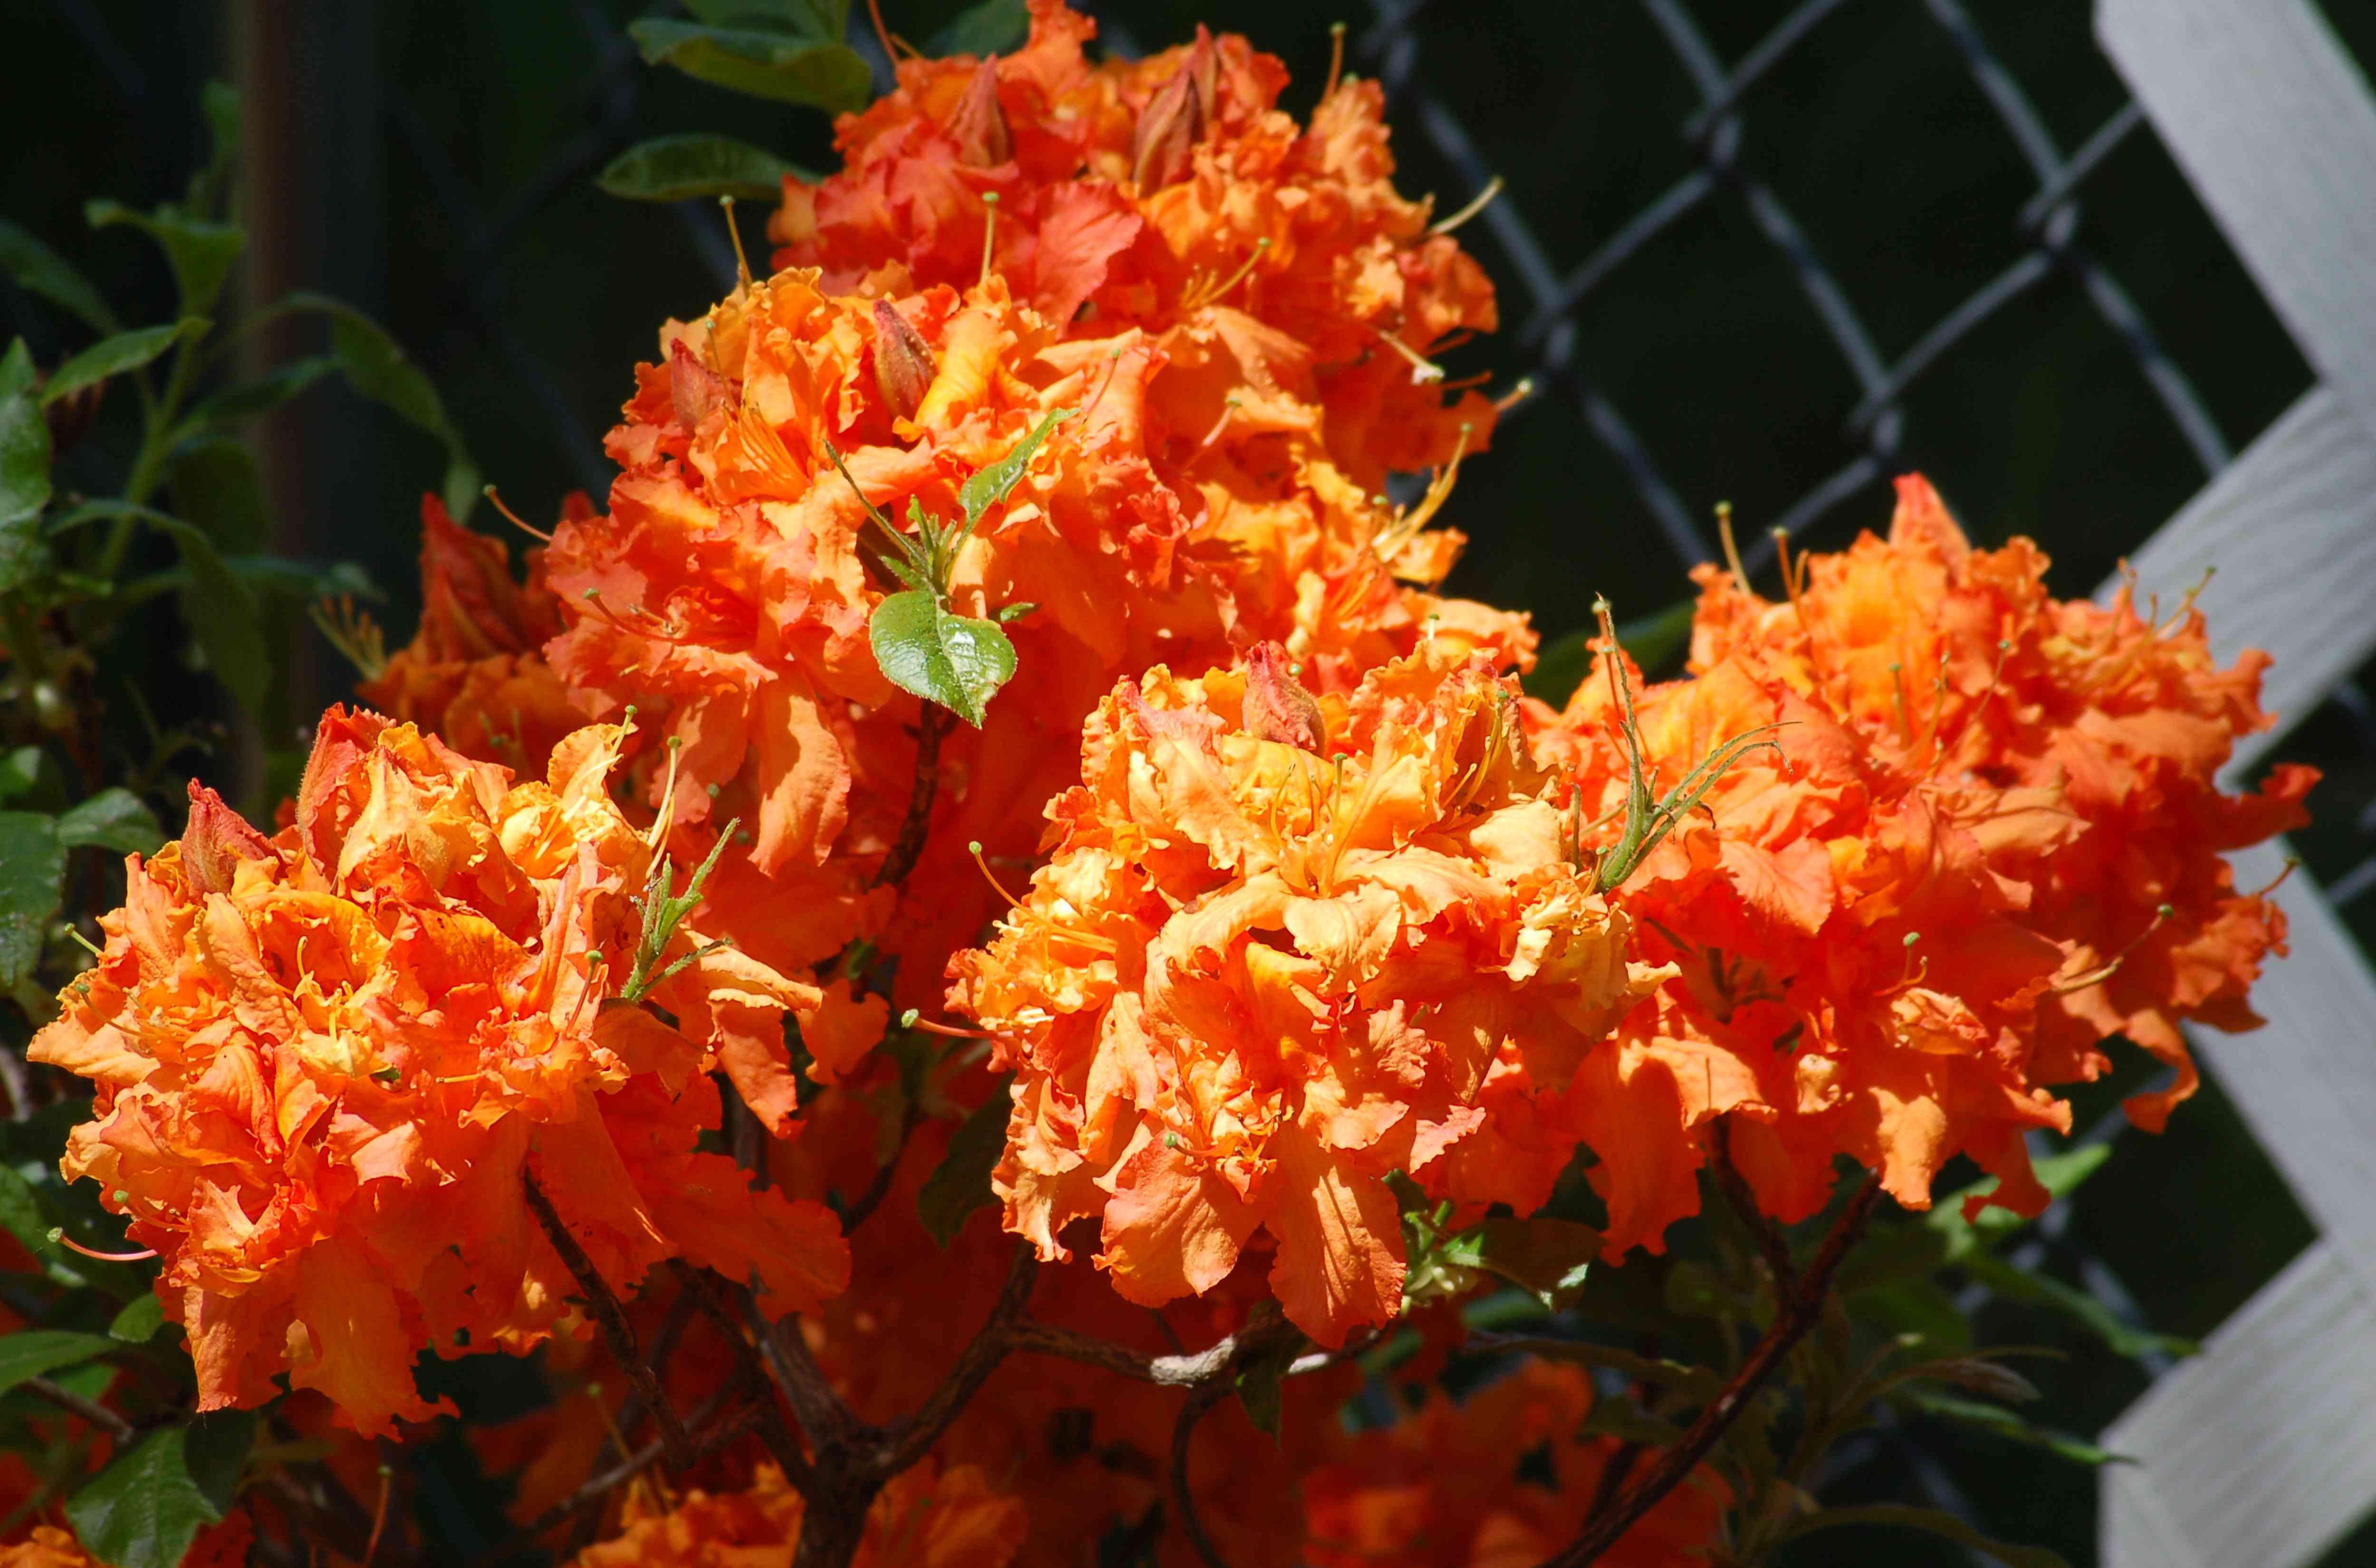 Gibraltar azalea plant with orange flowers.